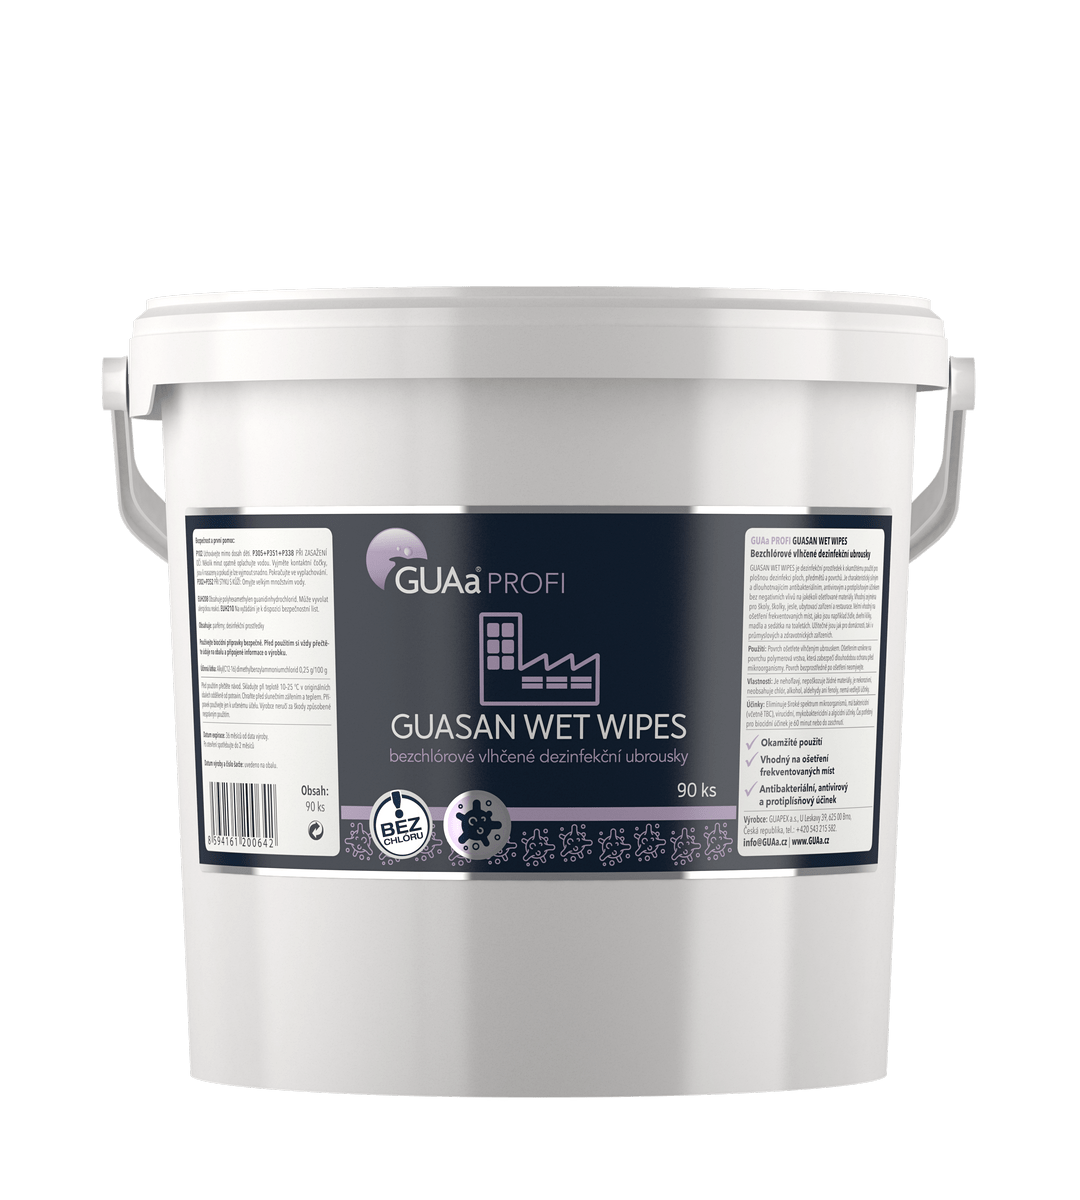 GUAa PROFI GUASAN WET WIPES - bezchlórové vlhčené dezinfekční ubrousky